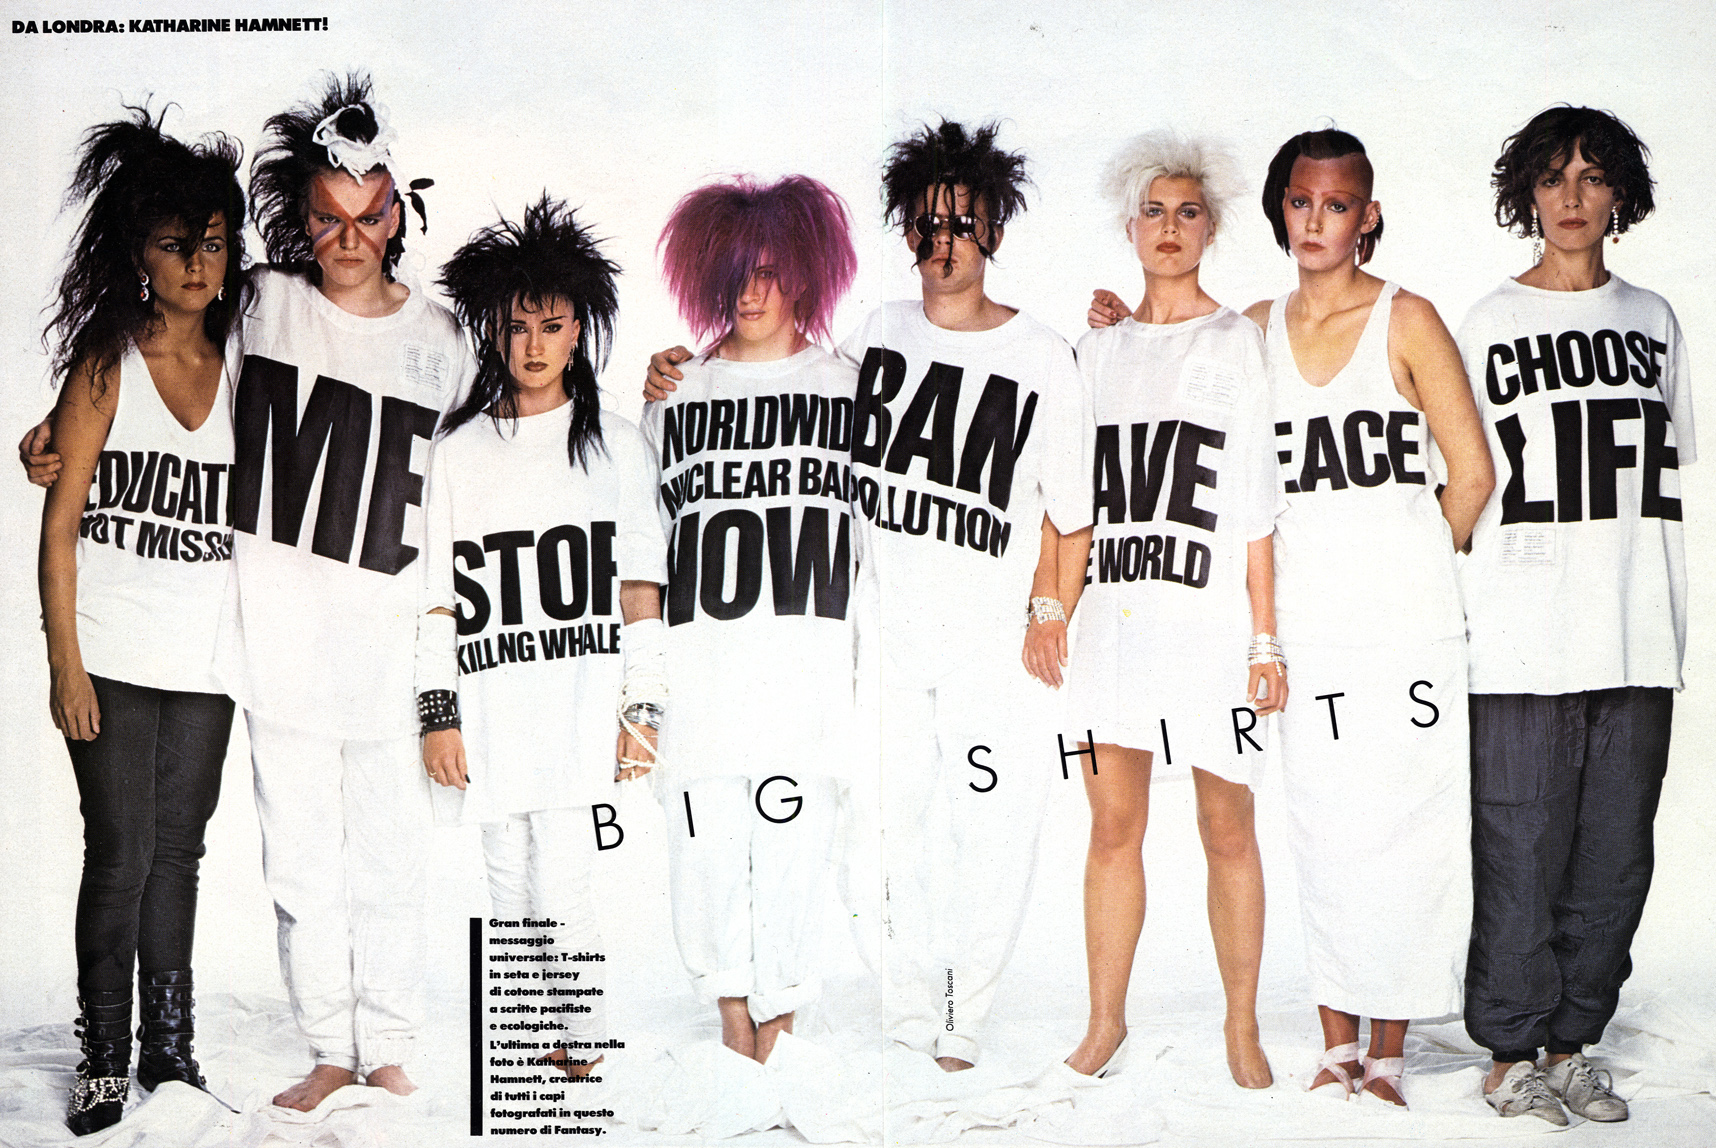 4-line-up-1985.jpg